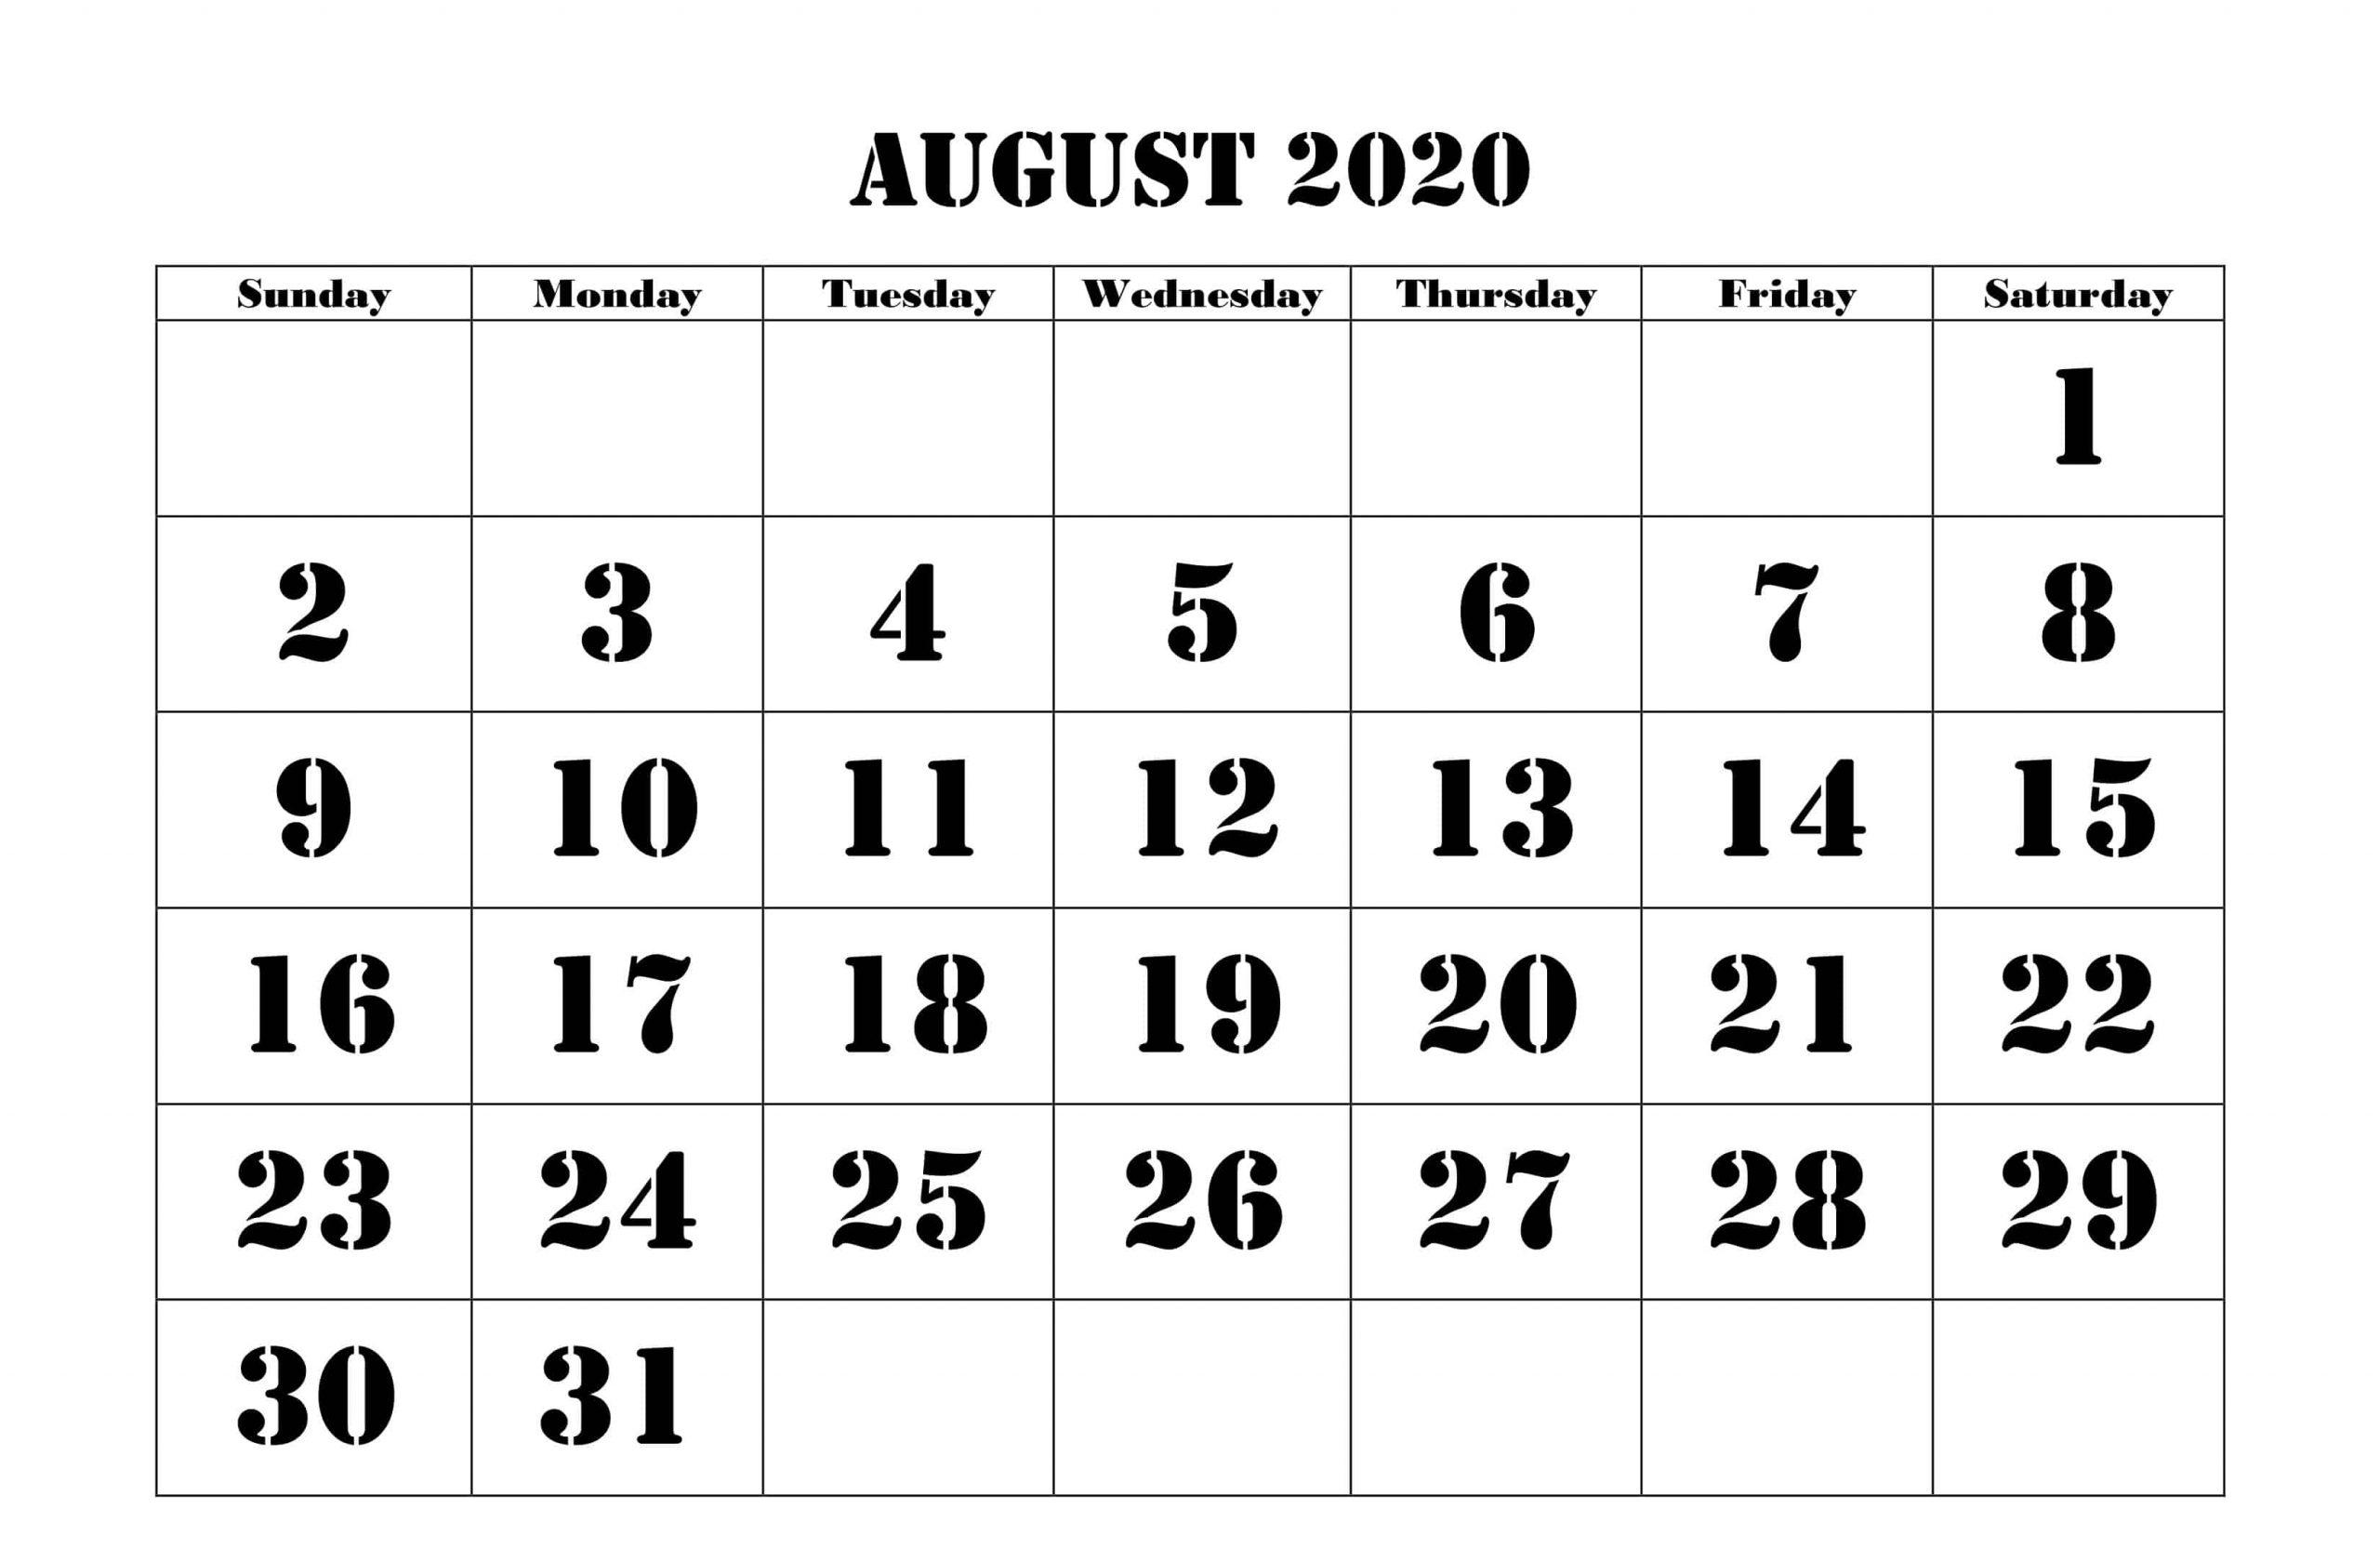 August 2020 Calendar India